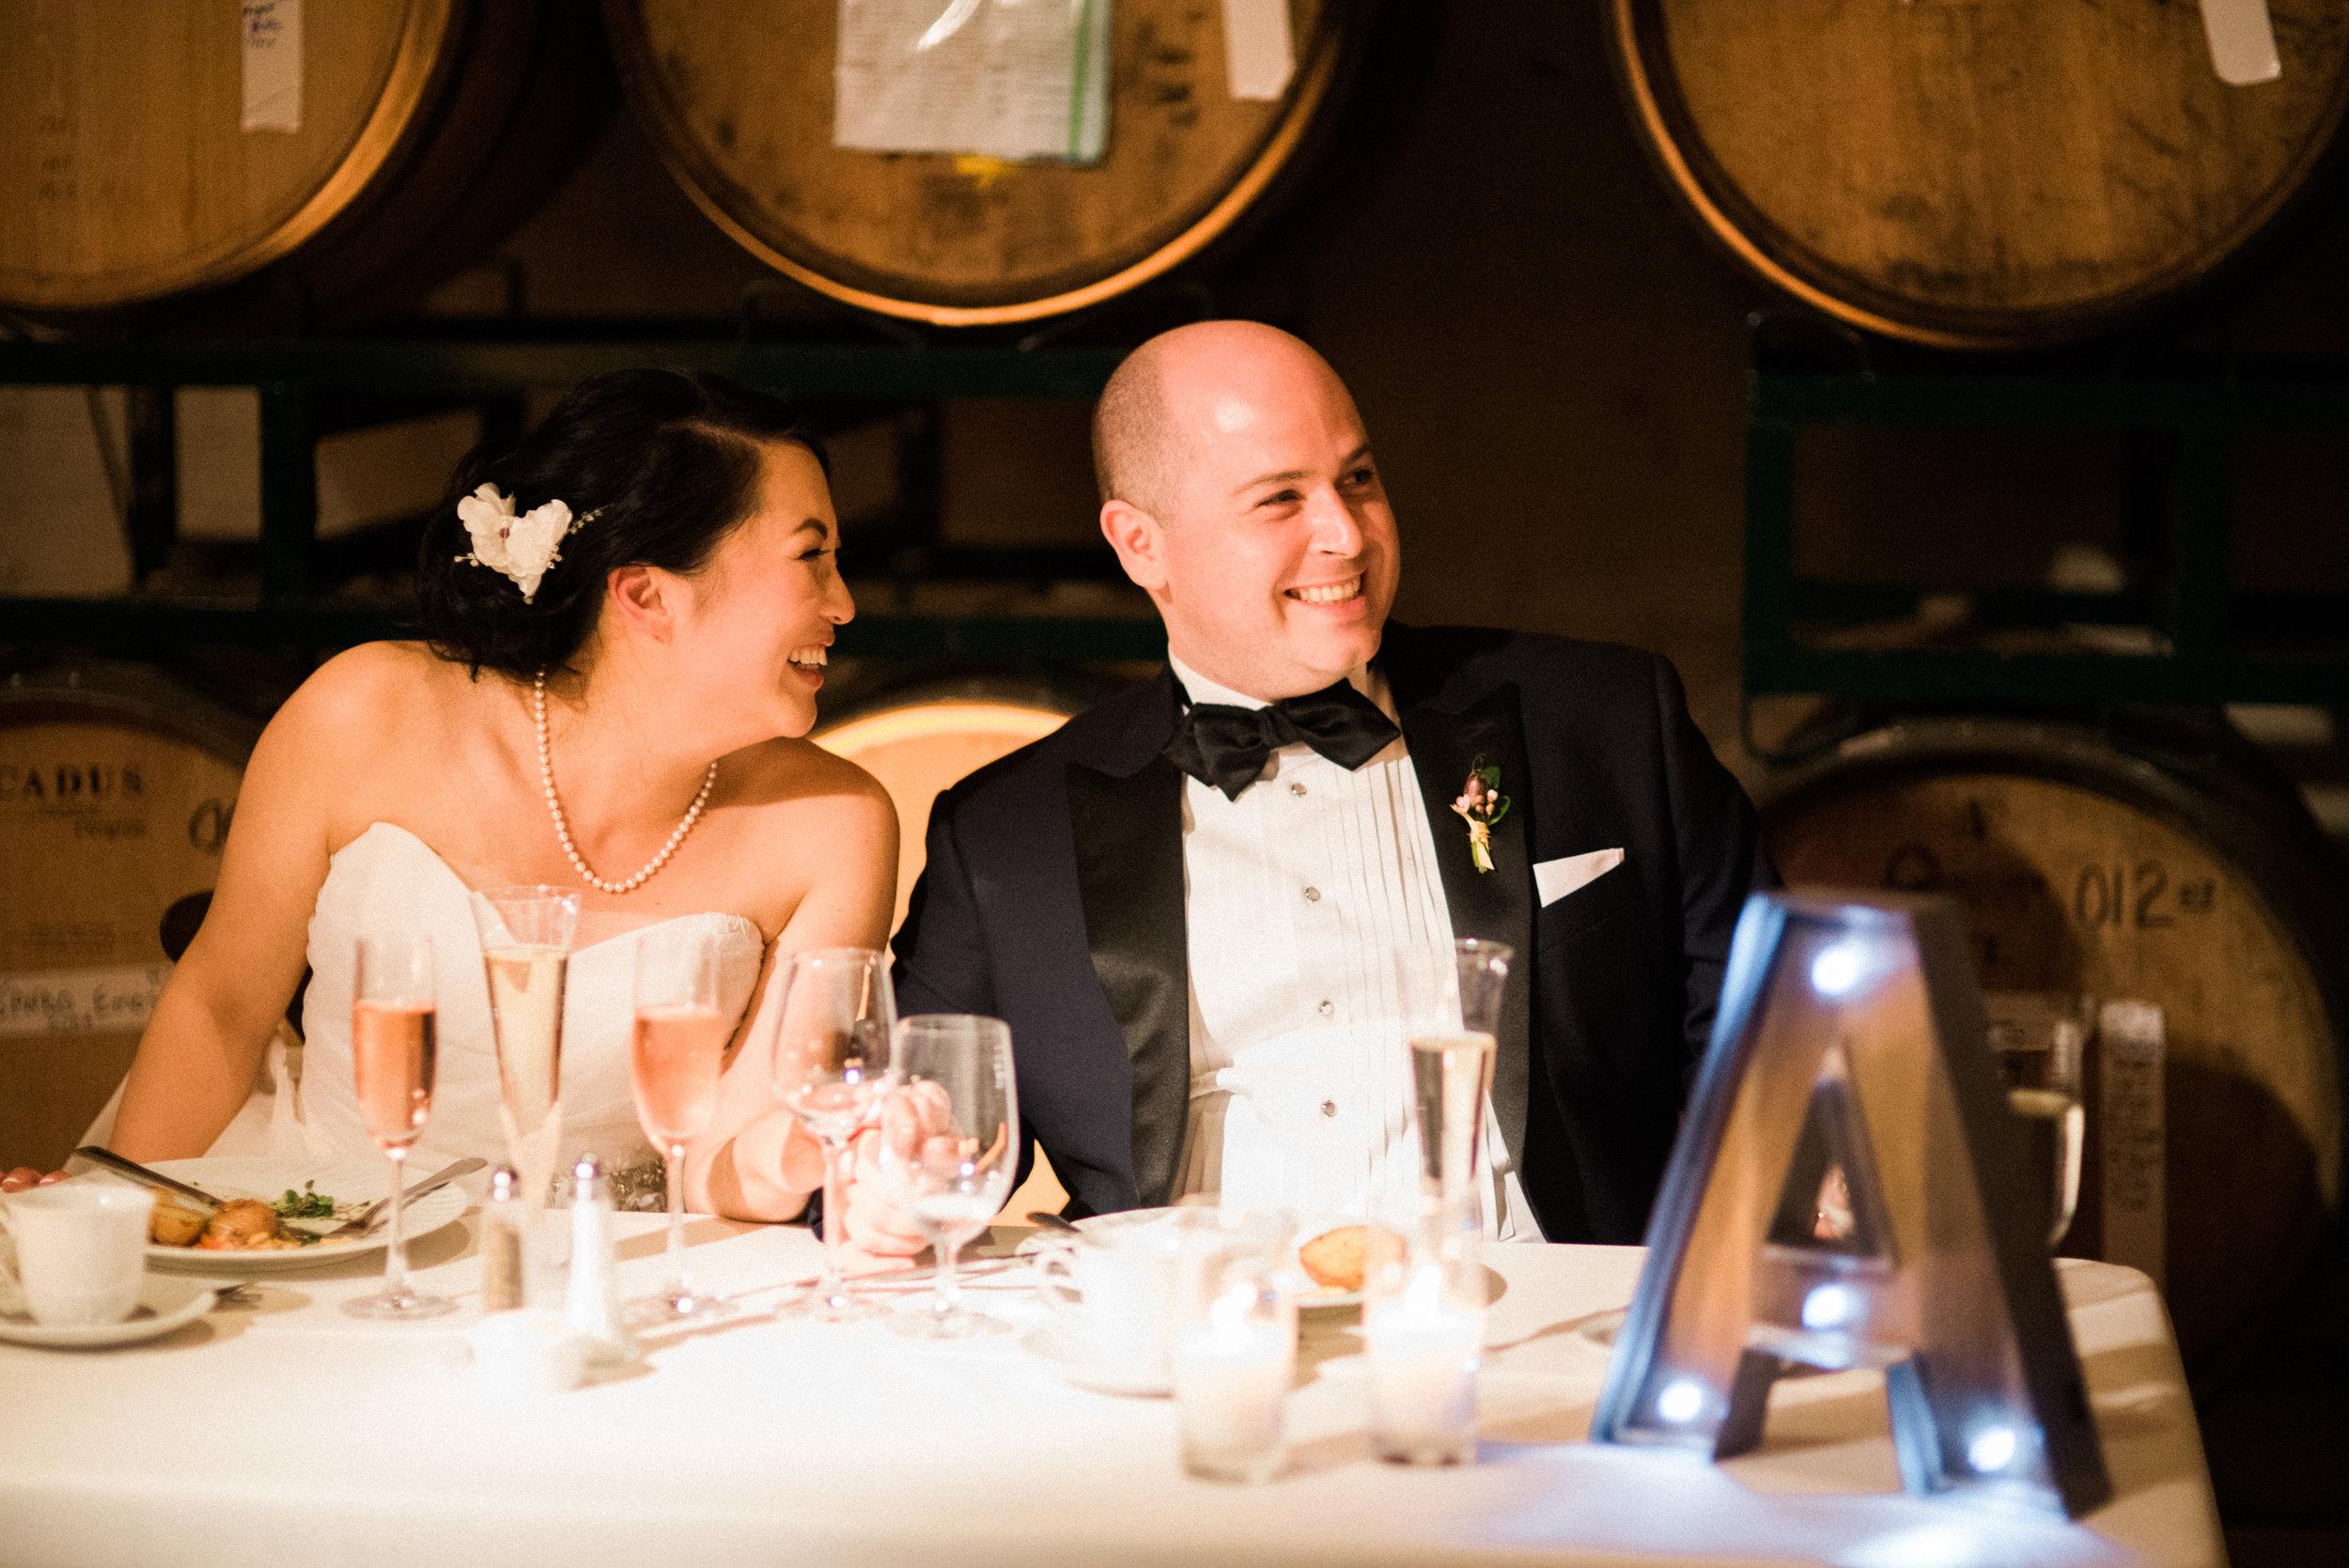 Swedenborgian Church Dogpatch Winery Wedding084.jpg